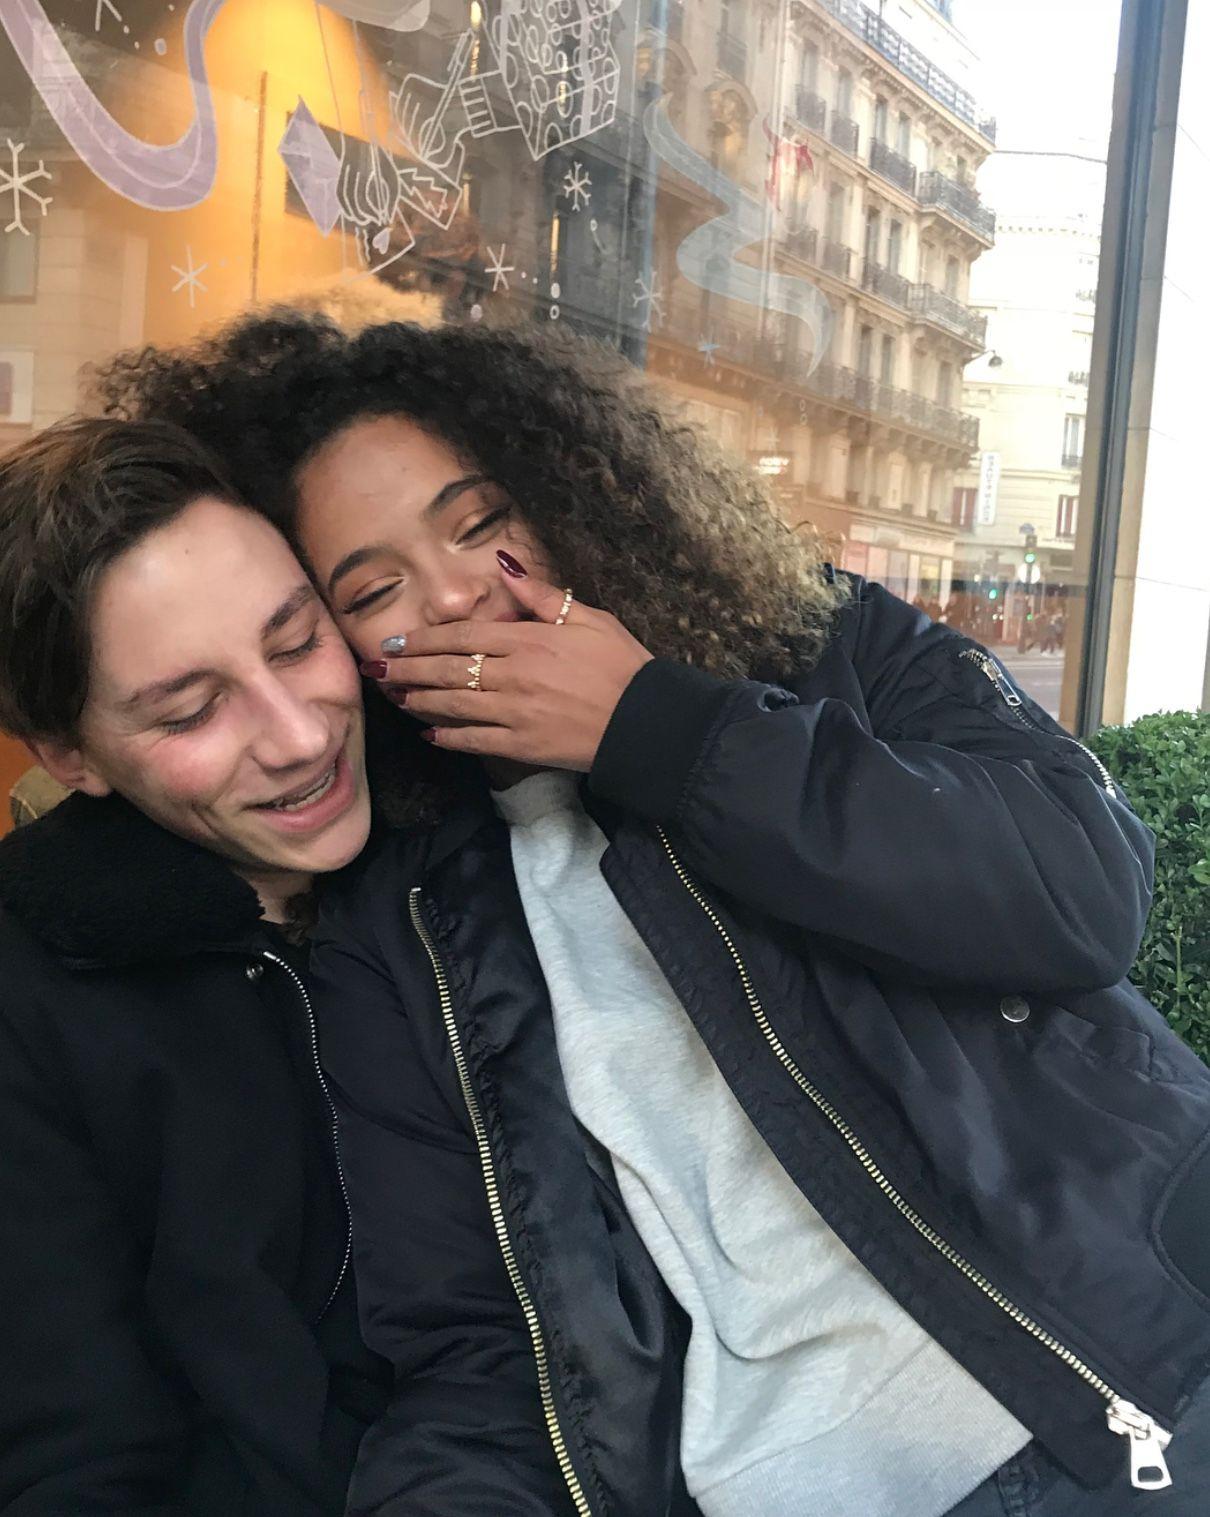 Beautiful Interracial Couple Love Wmbw Bwwm Swirl Biracial Mixed Lovingday Relationshipgoals Biracial Couples Interracial Couples Cute Couples